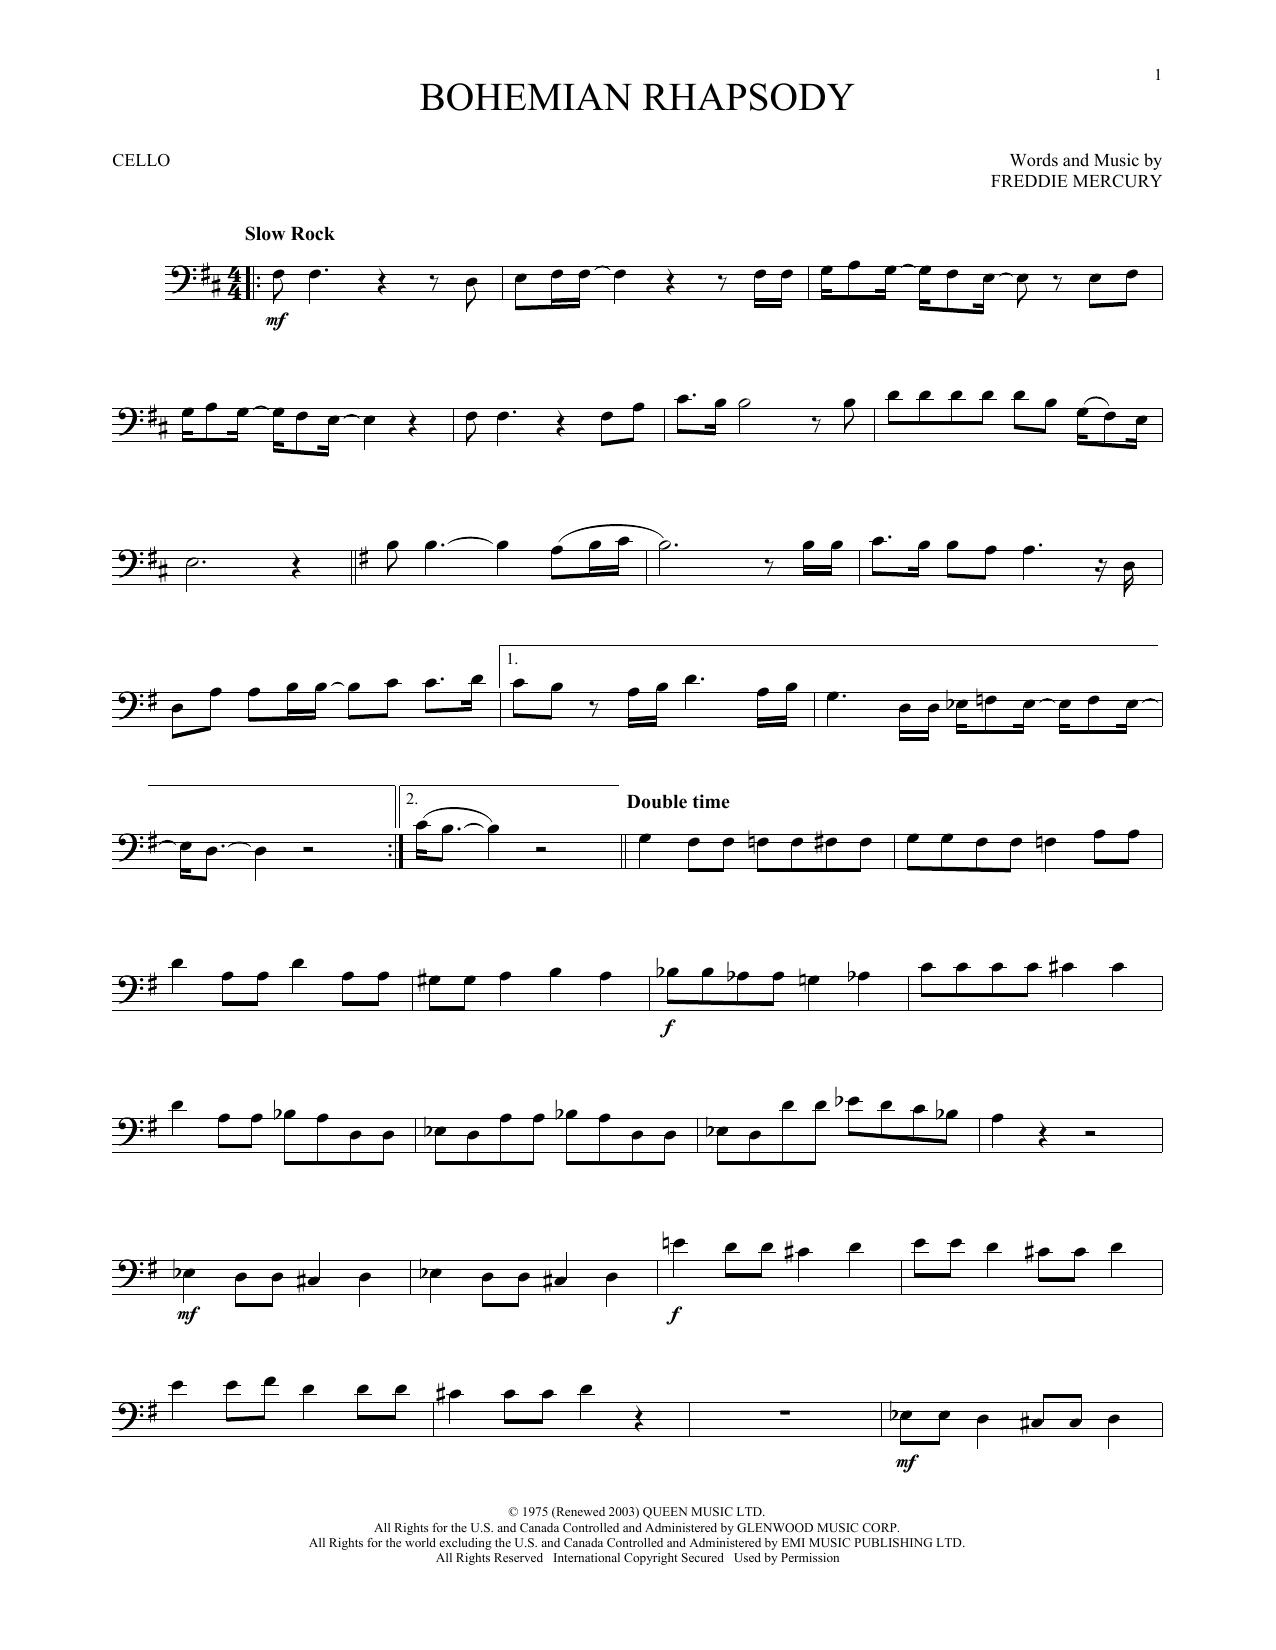 Bohemian Rhapsody (Cello Solo)